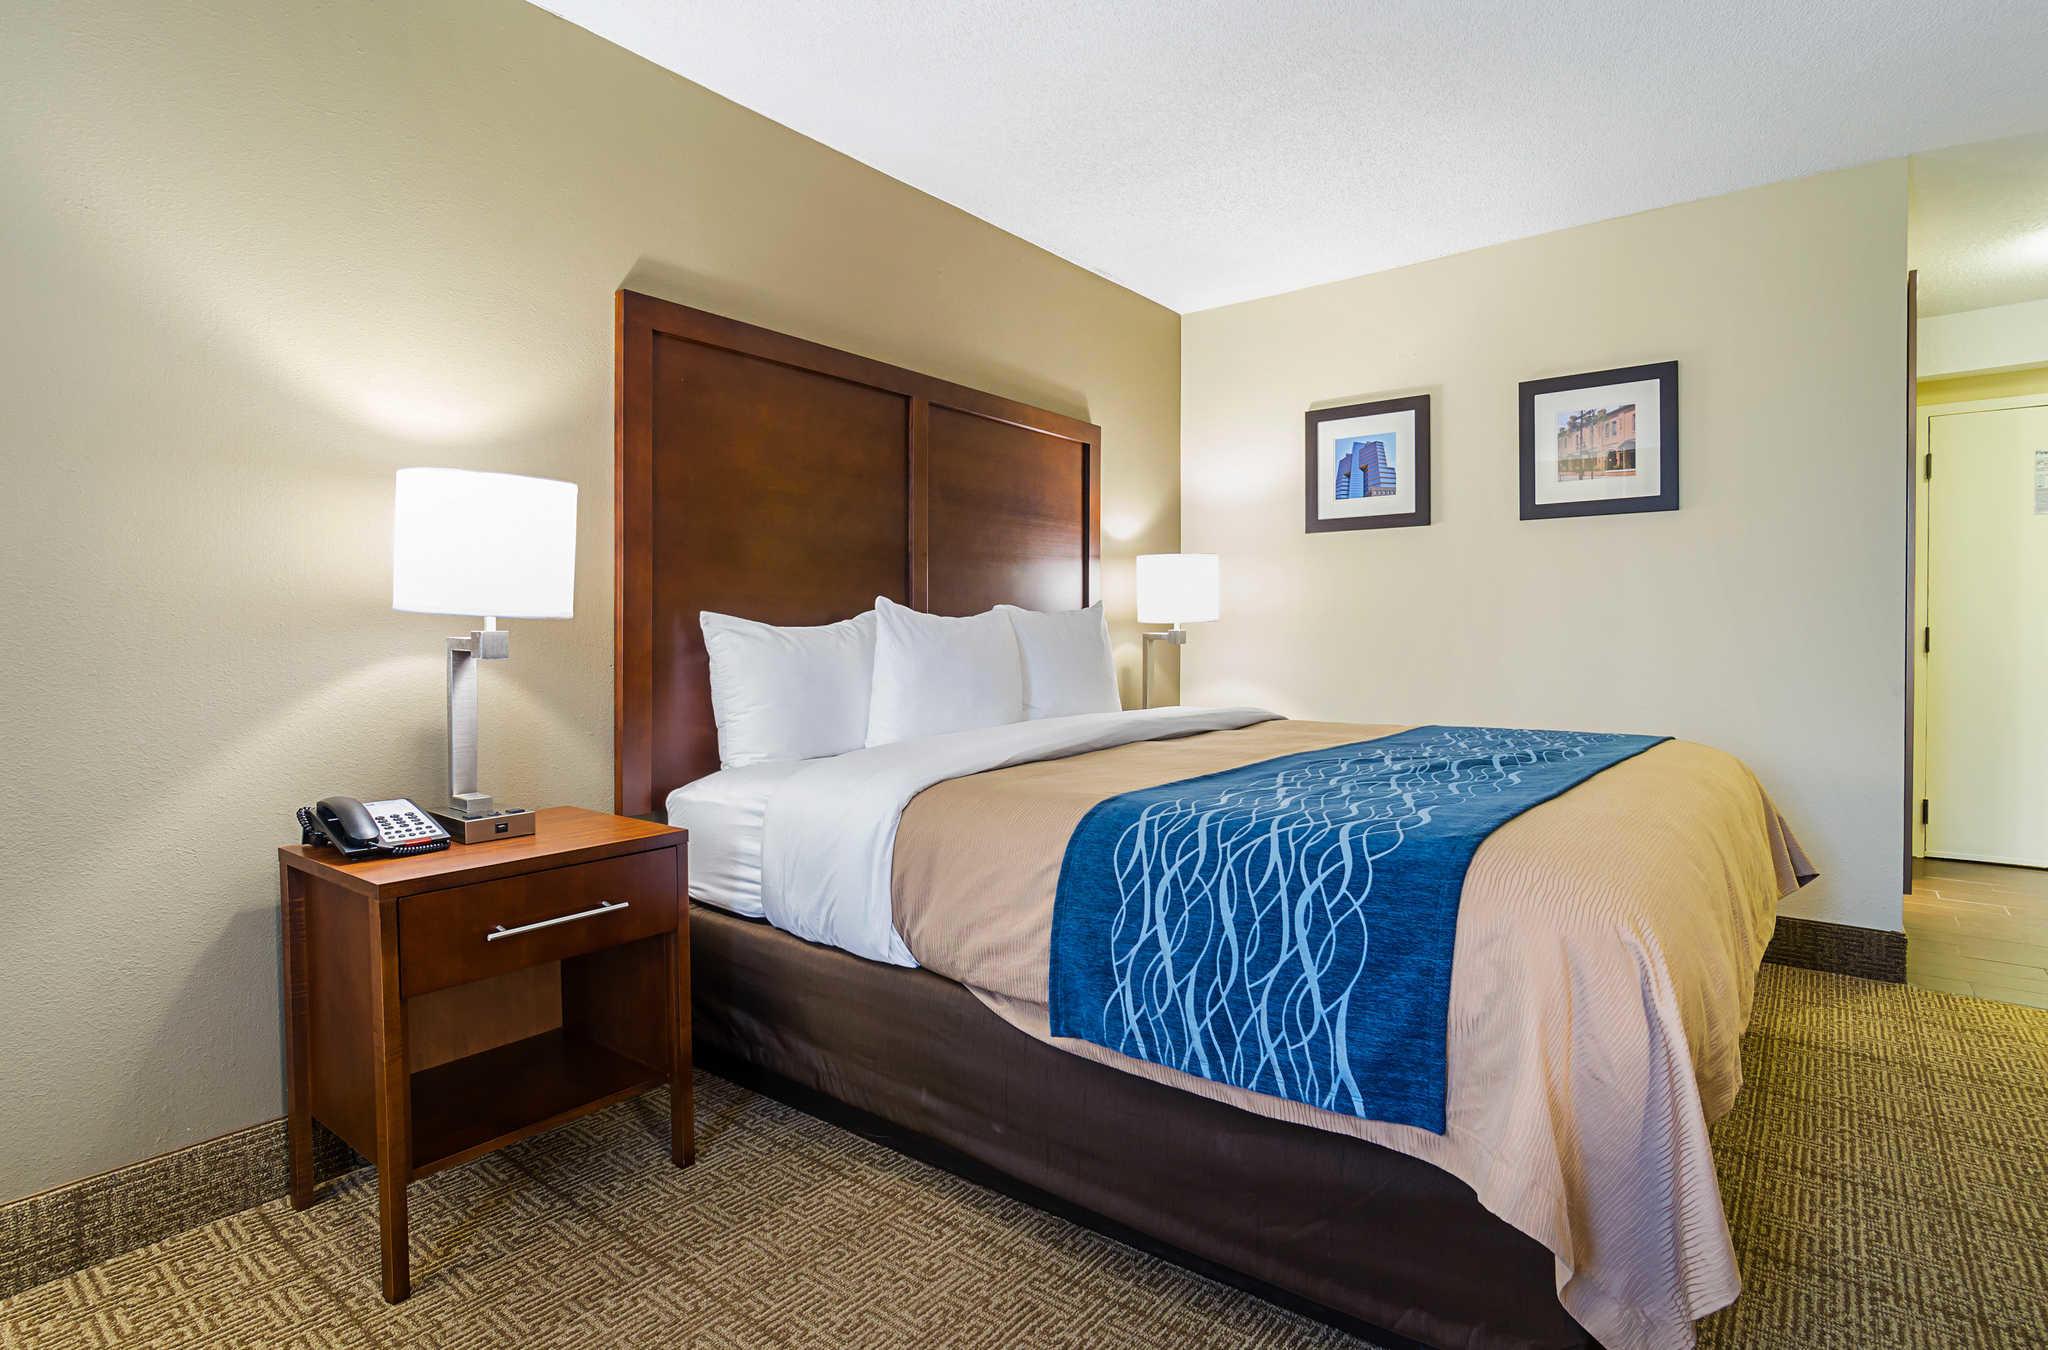 Comfort Inn & Suites Duke University-Downtown image 21